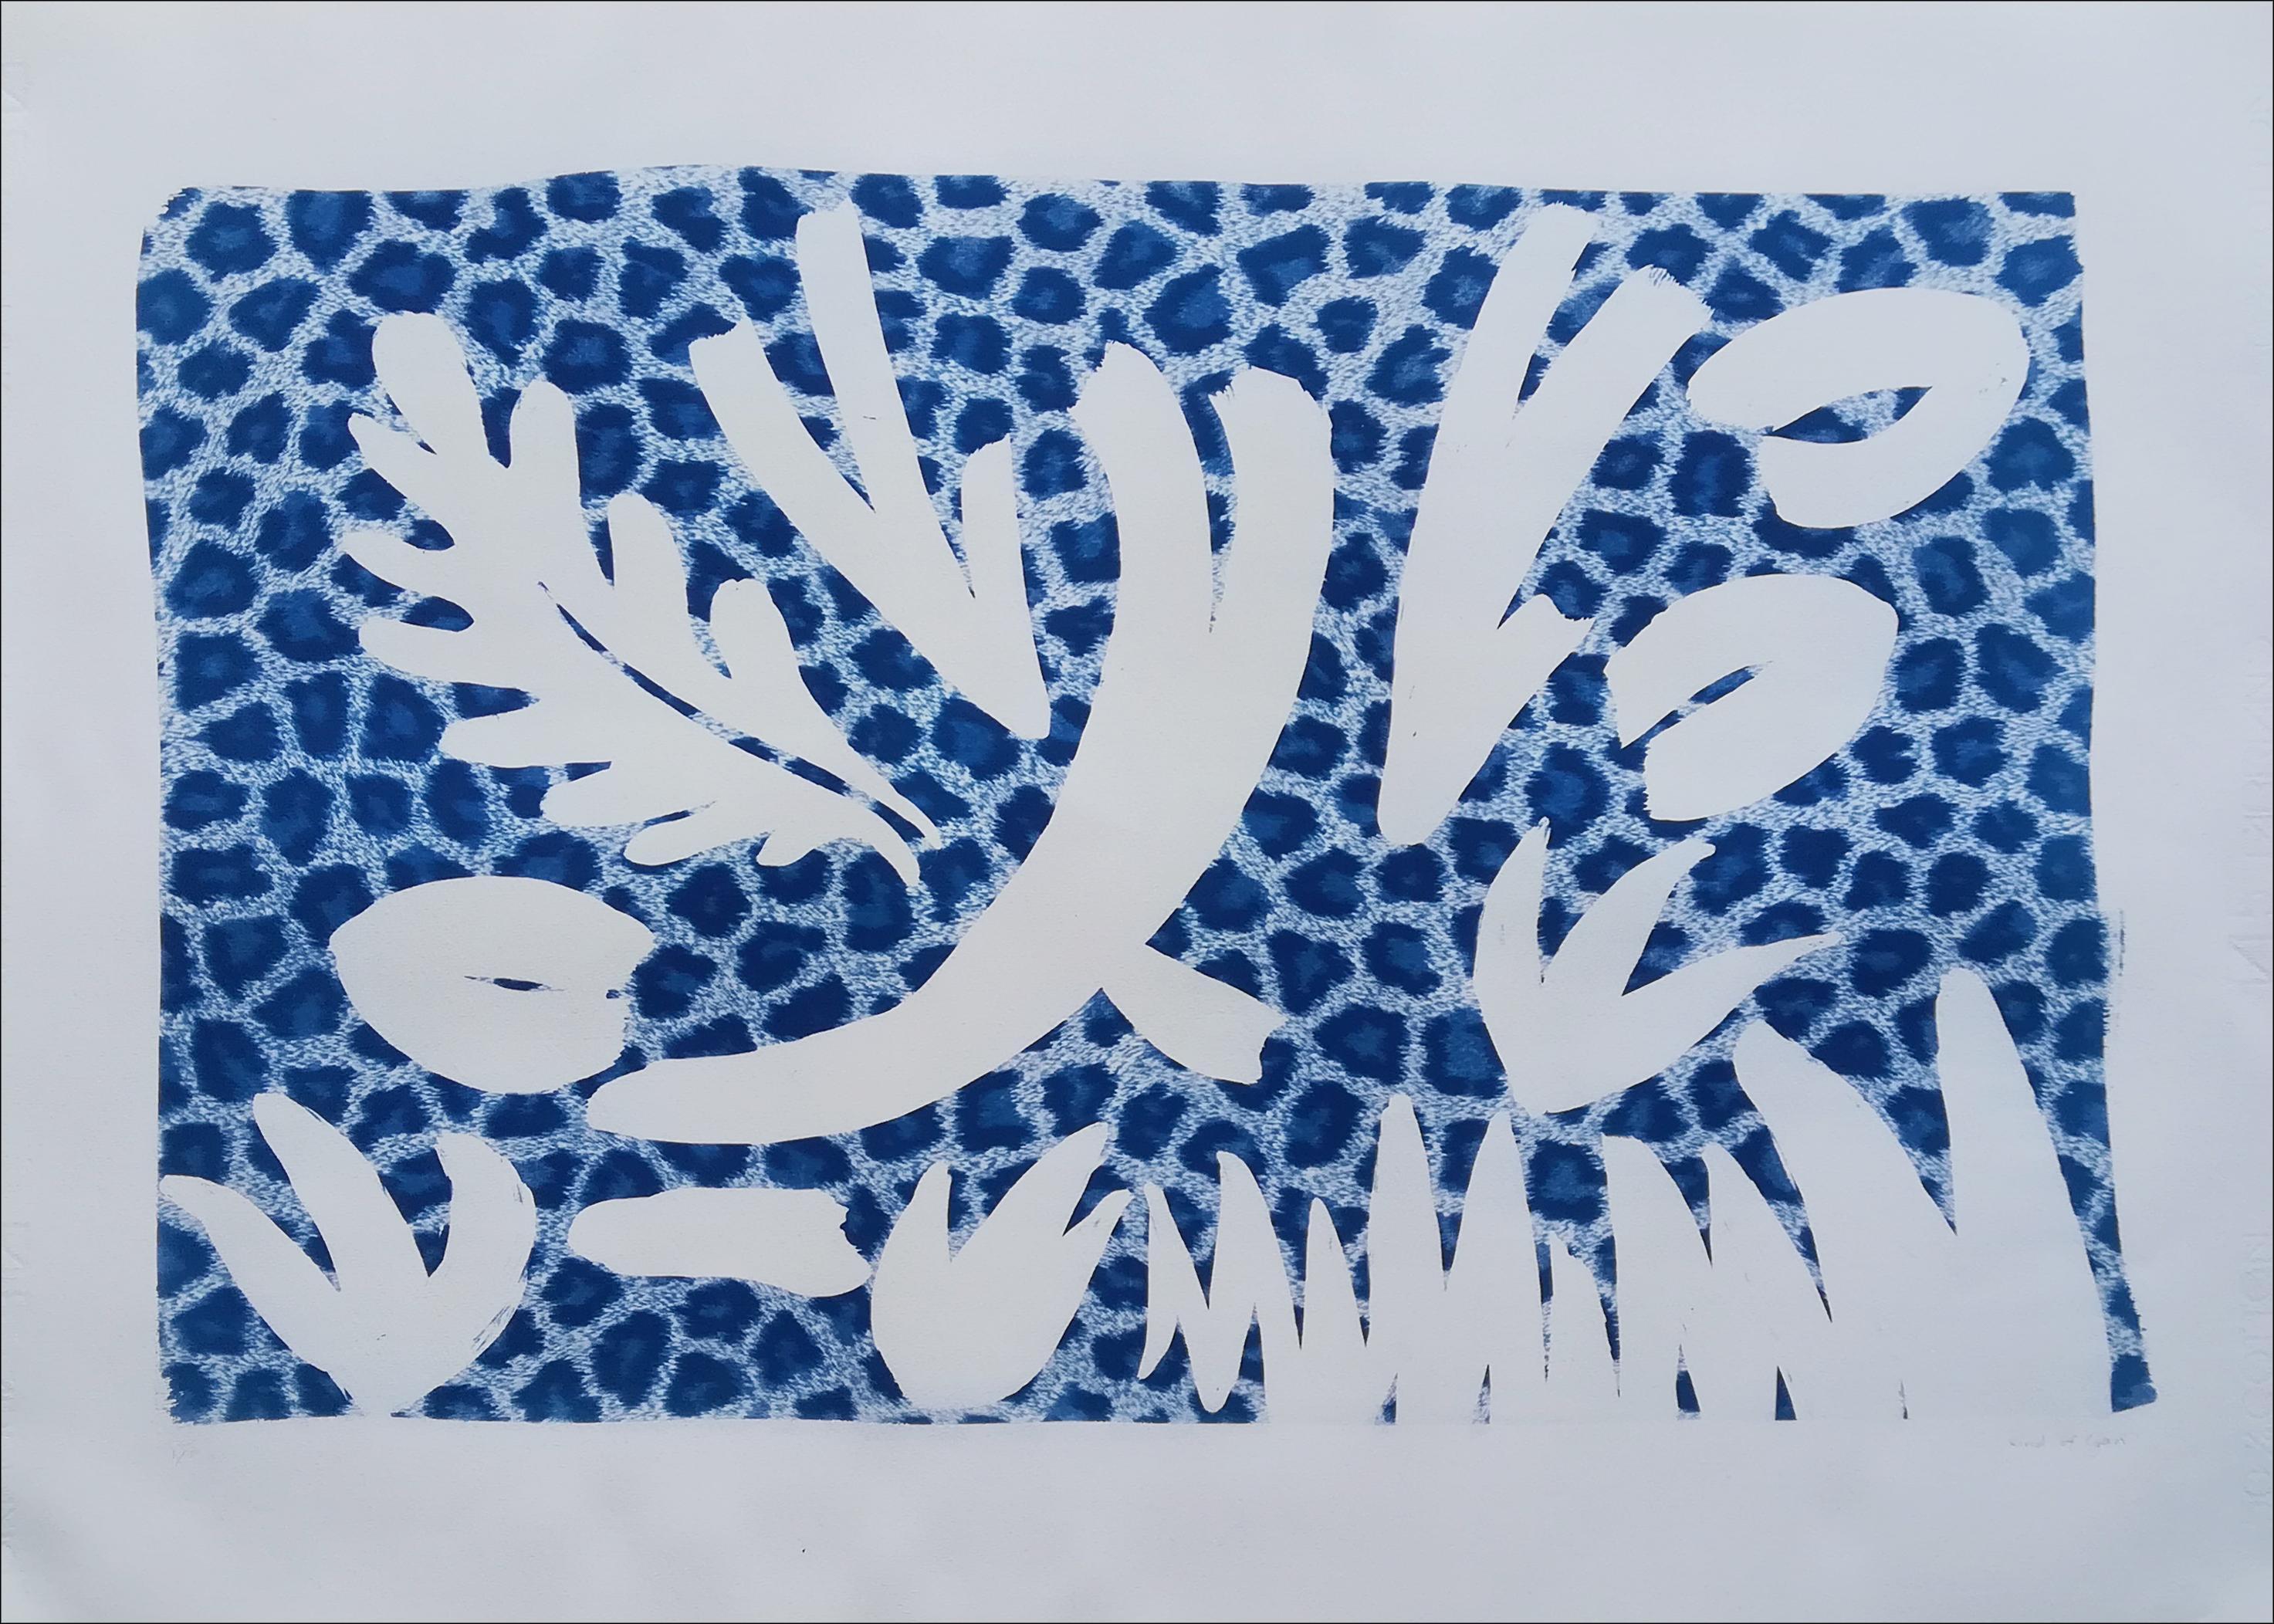 Botanical Garden Shapes on Animal Print Background, Handmade Photogram or Mono